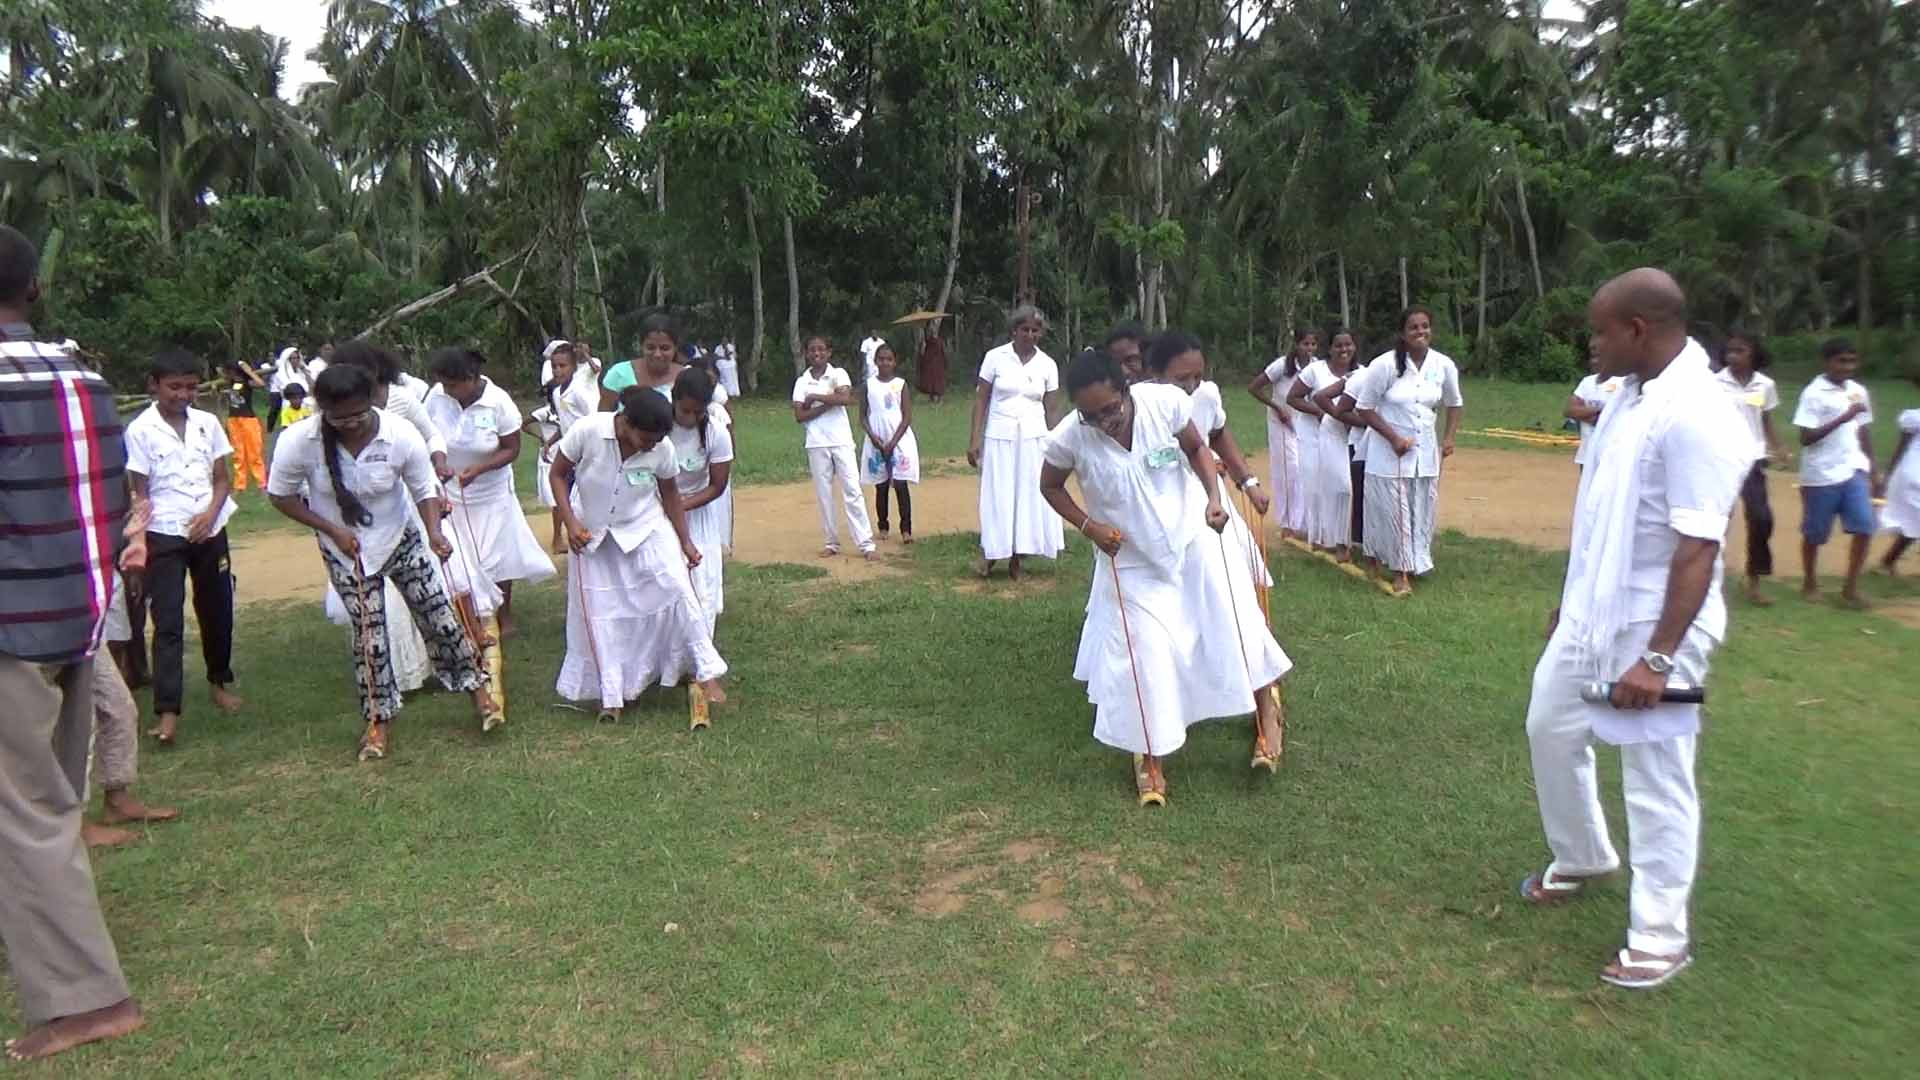 Sati Pasala Mindfulness Camp at Meethirigala Kanishta Vidyalaya-mindful games (18)